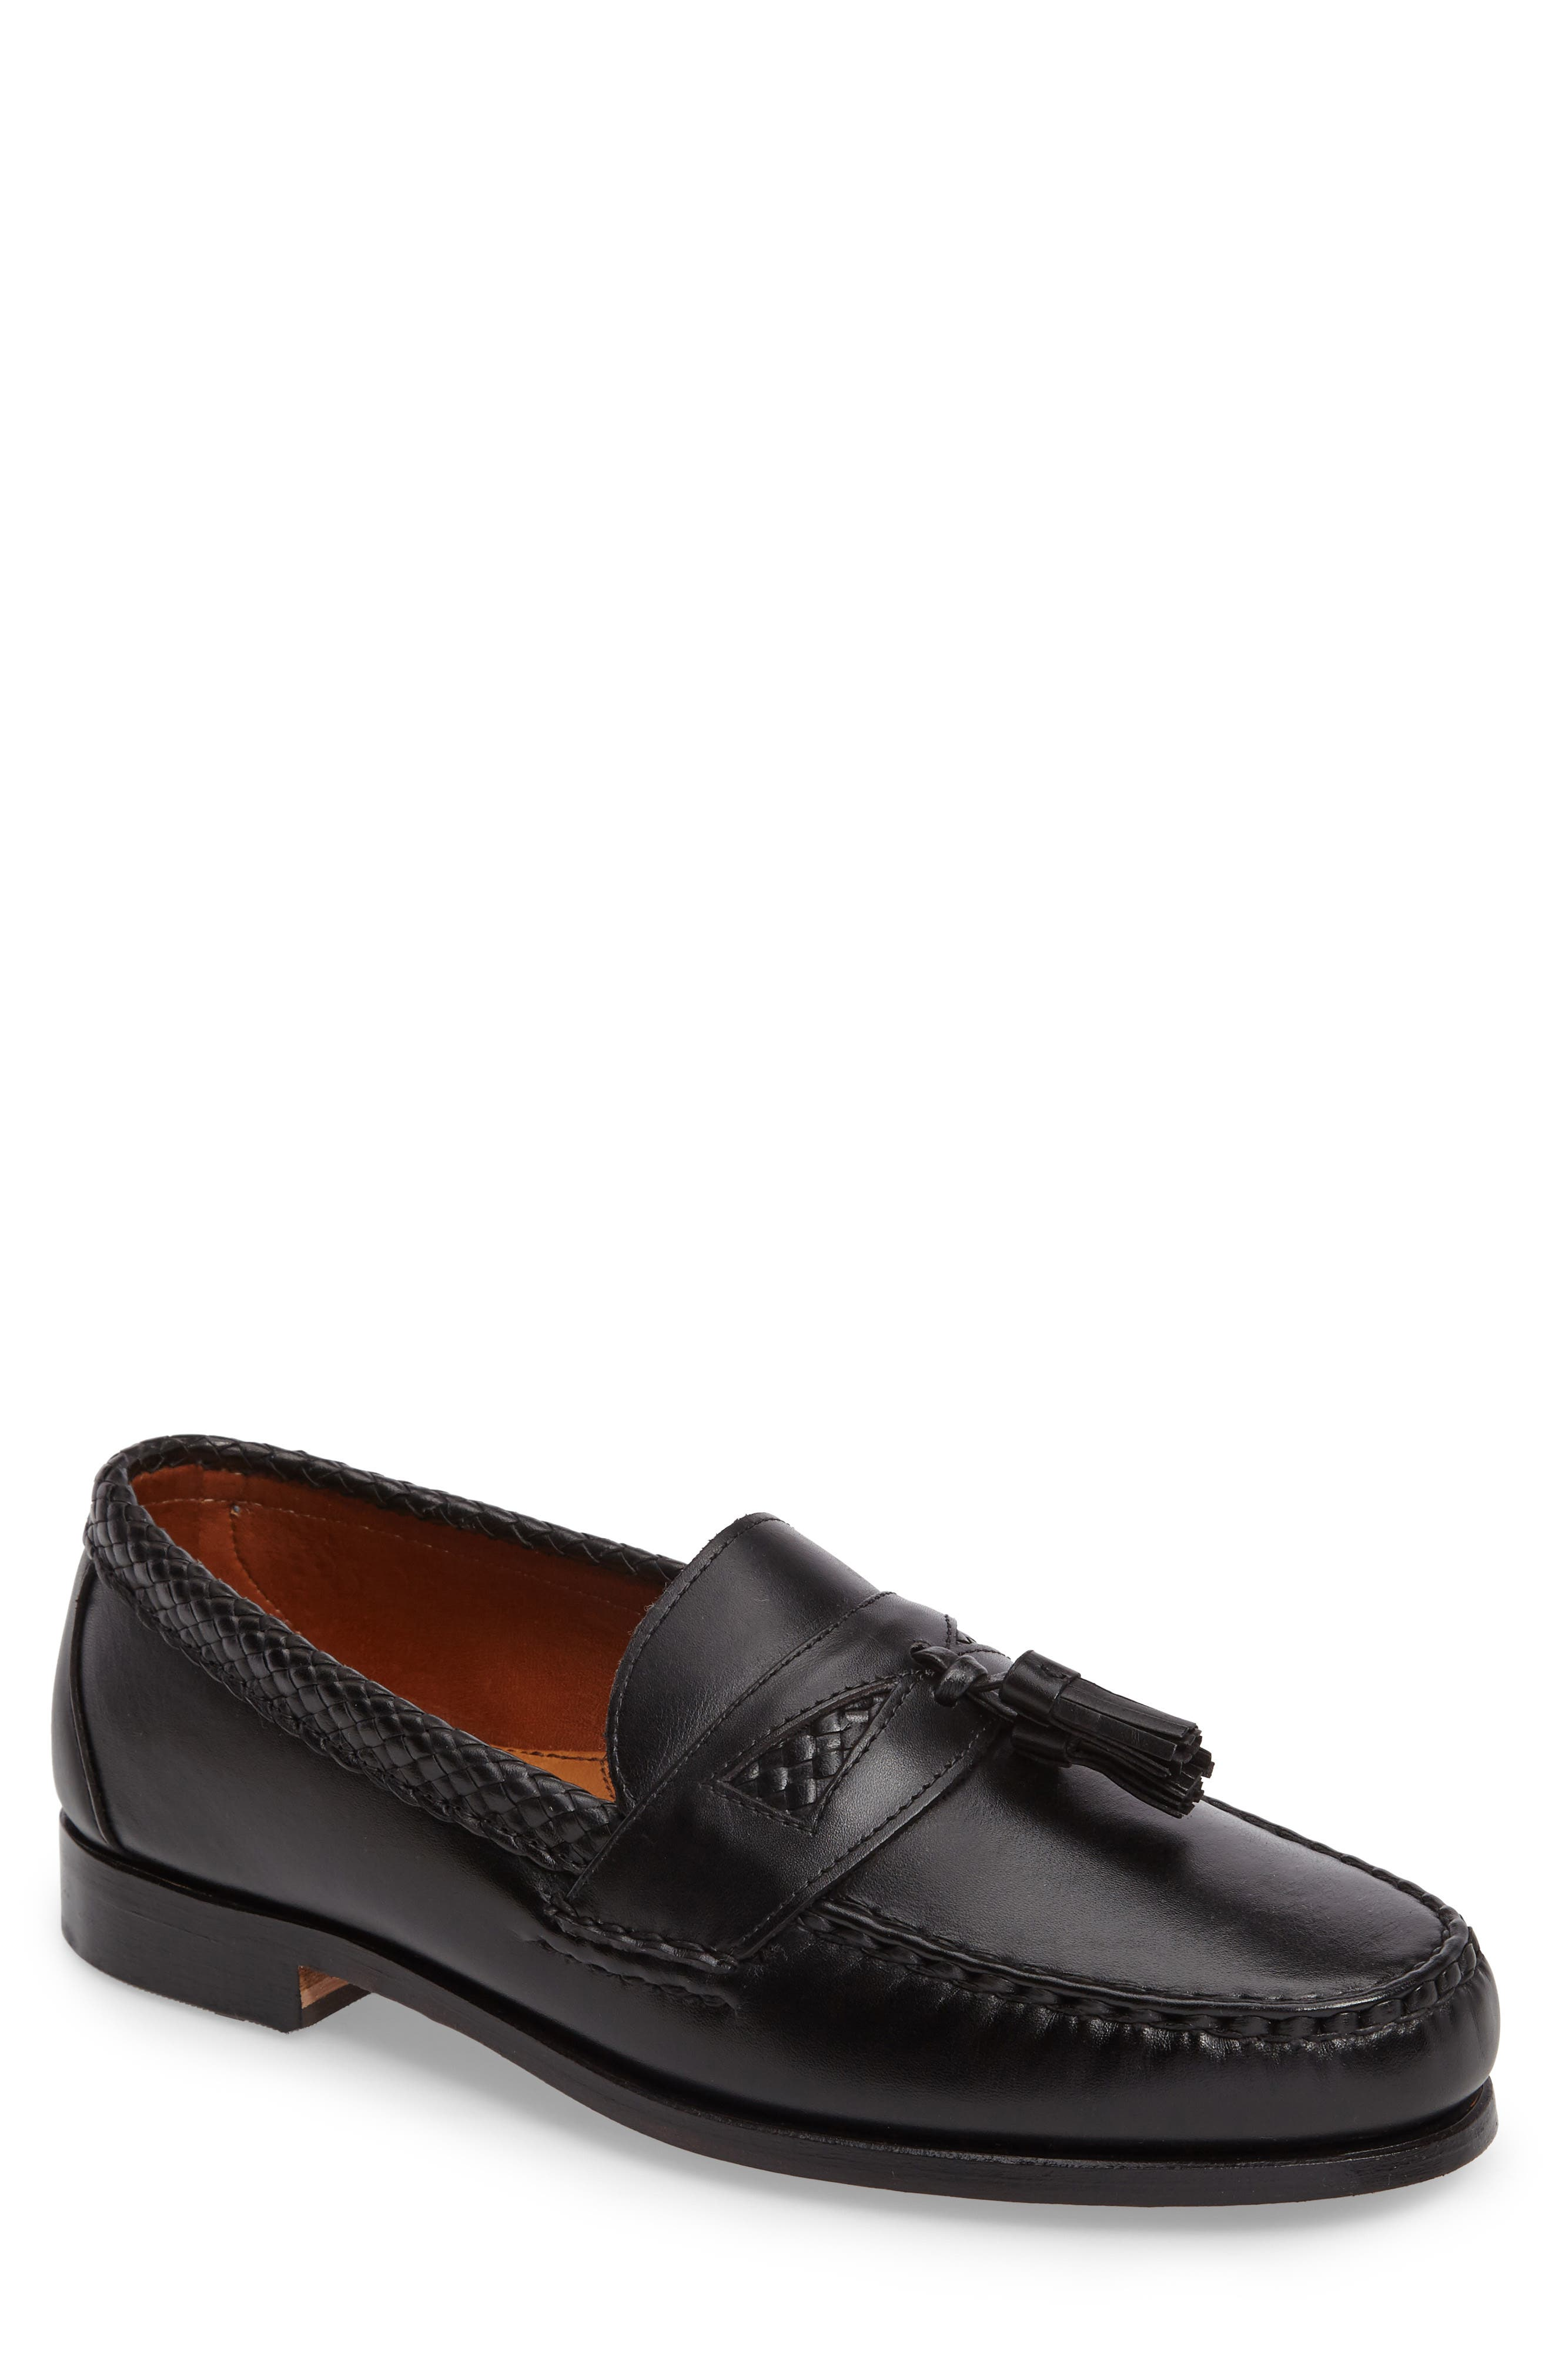 'Maxfield' Loafer,                         Main,                         color, BLACK